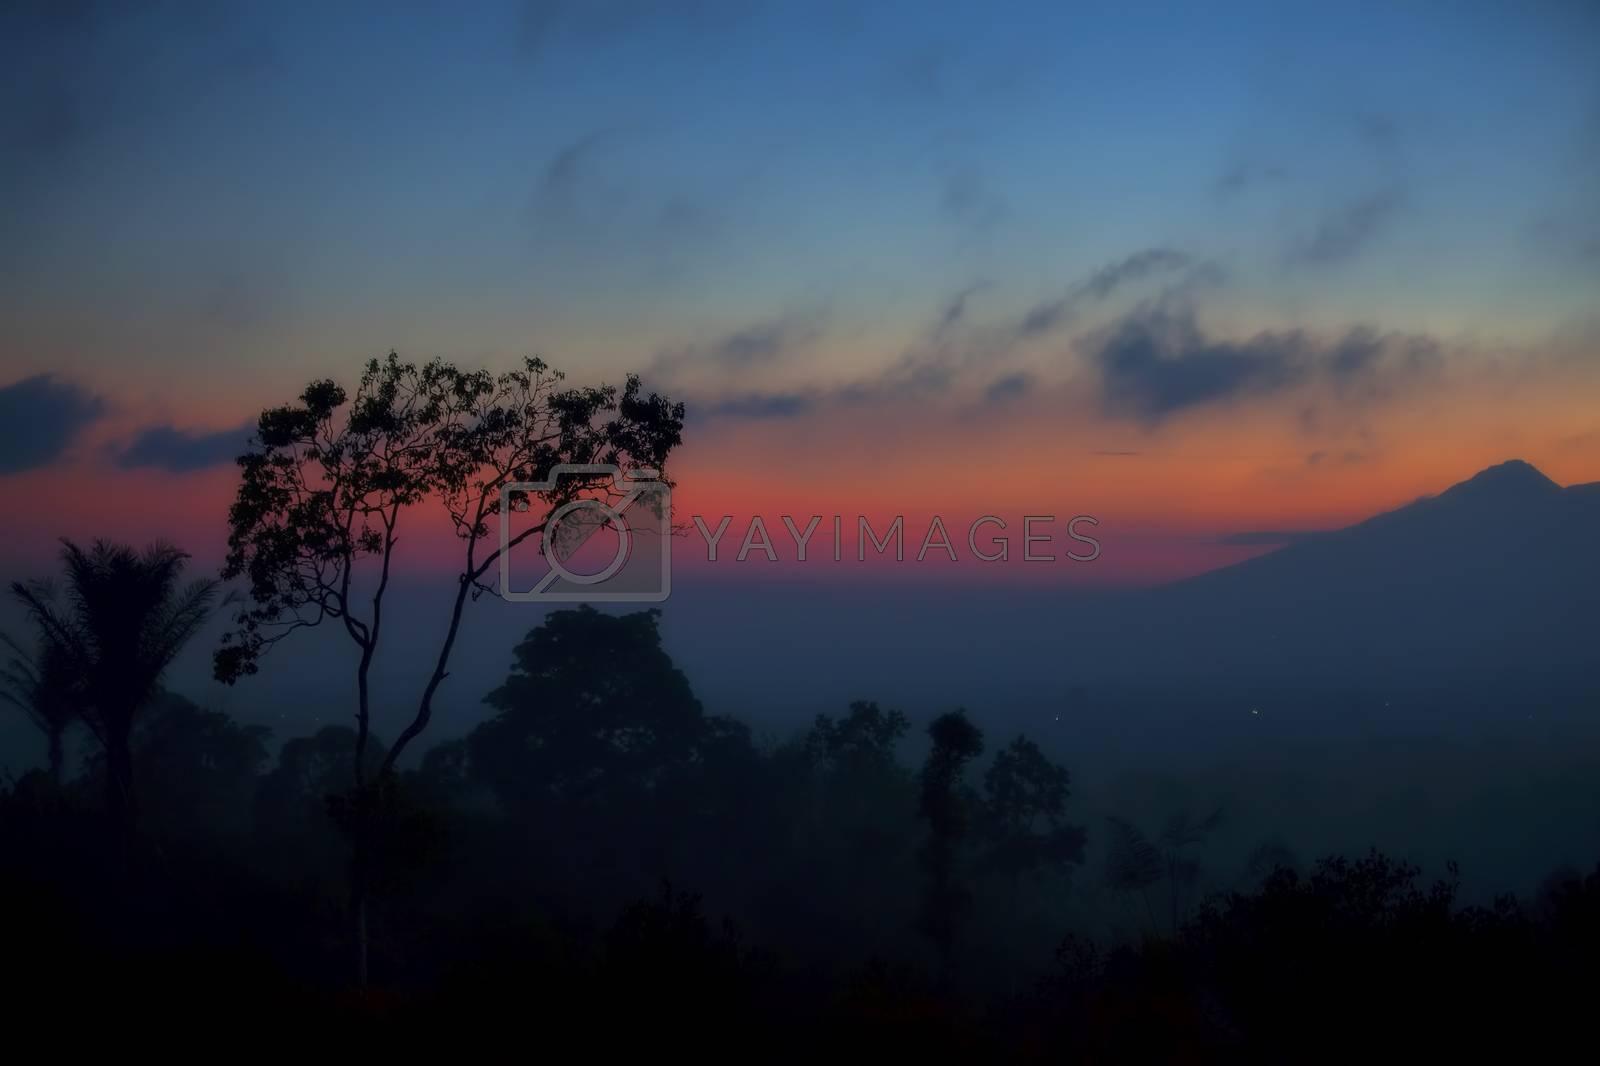 Misty sunset over the lush Balinese landscape